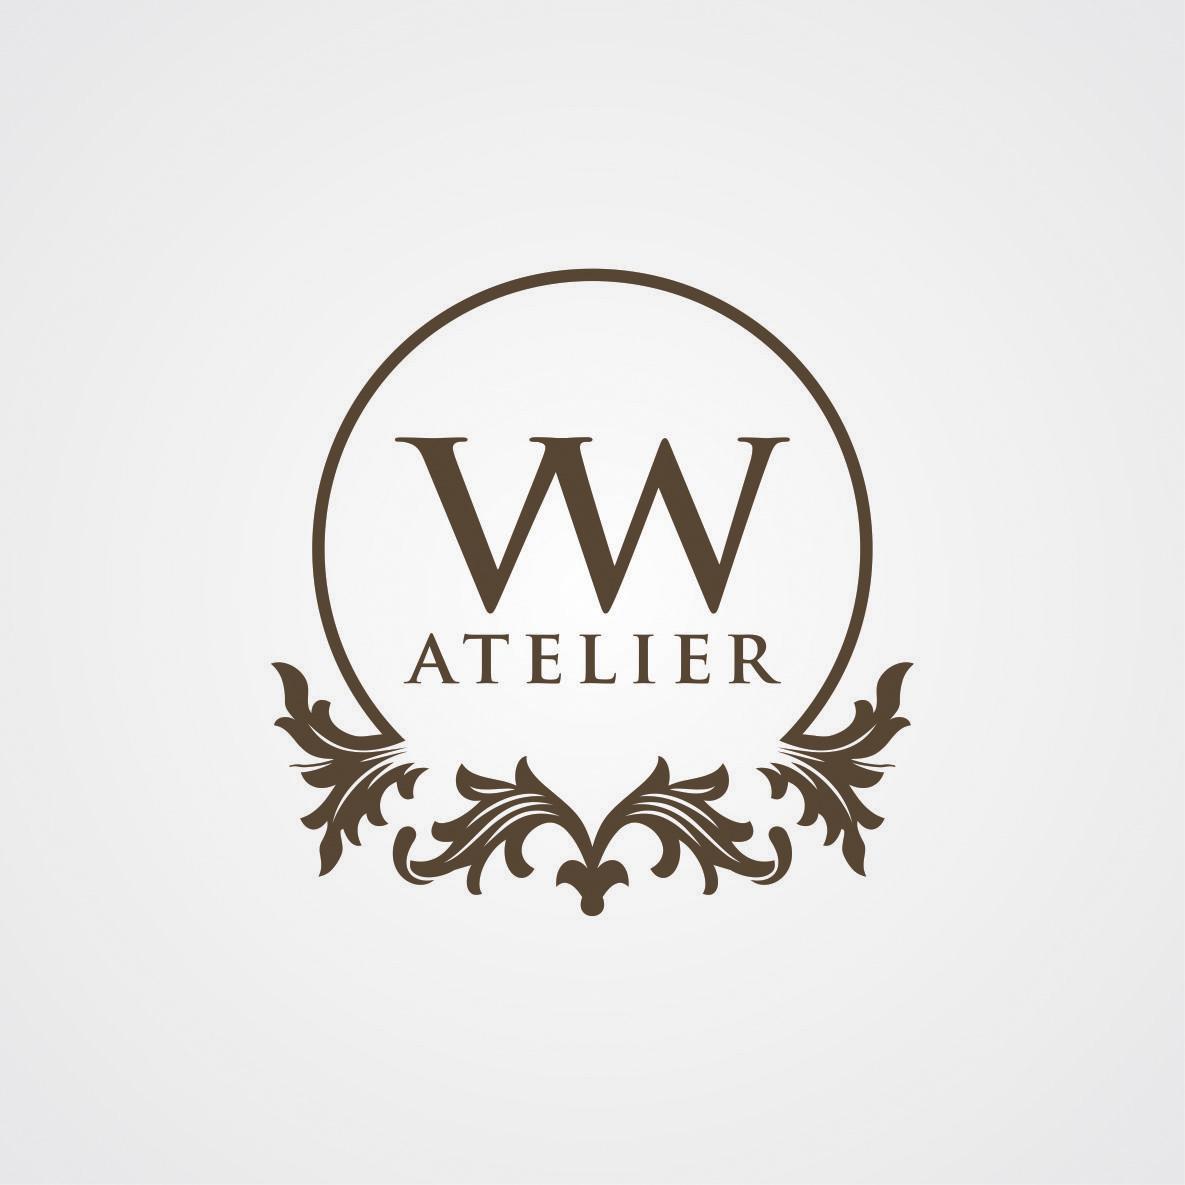 V.W Atelier